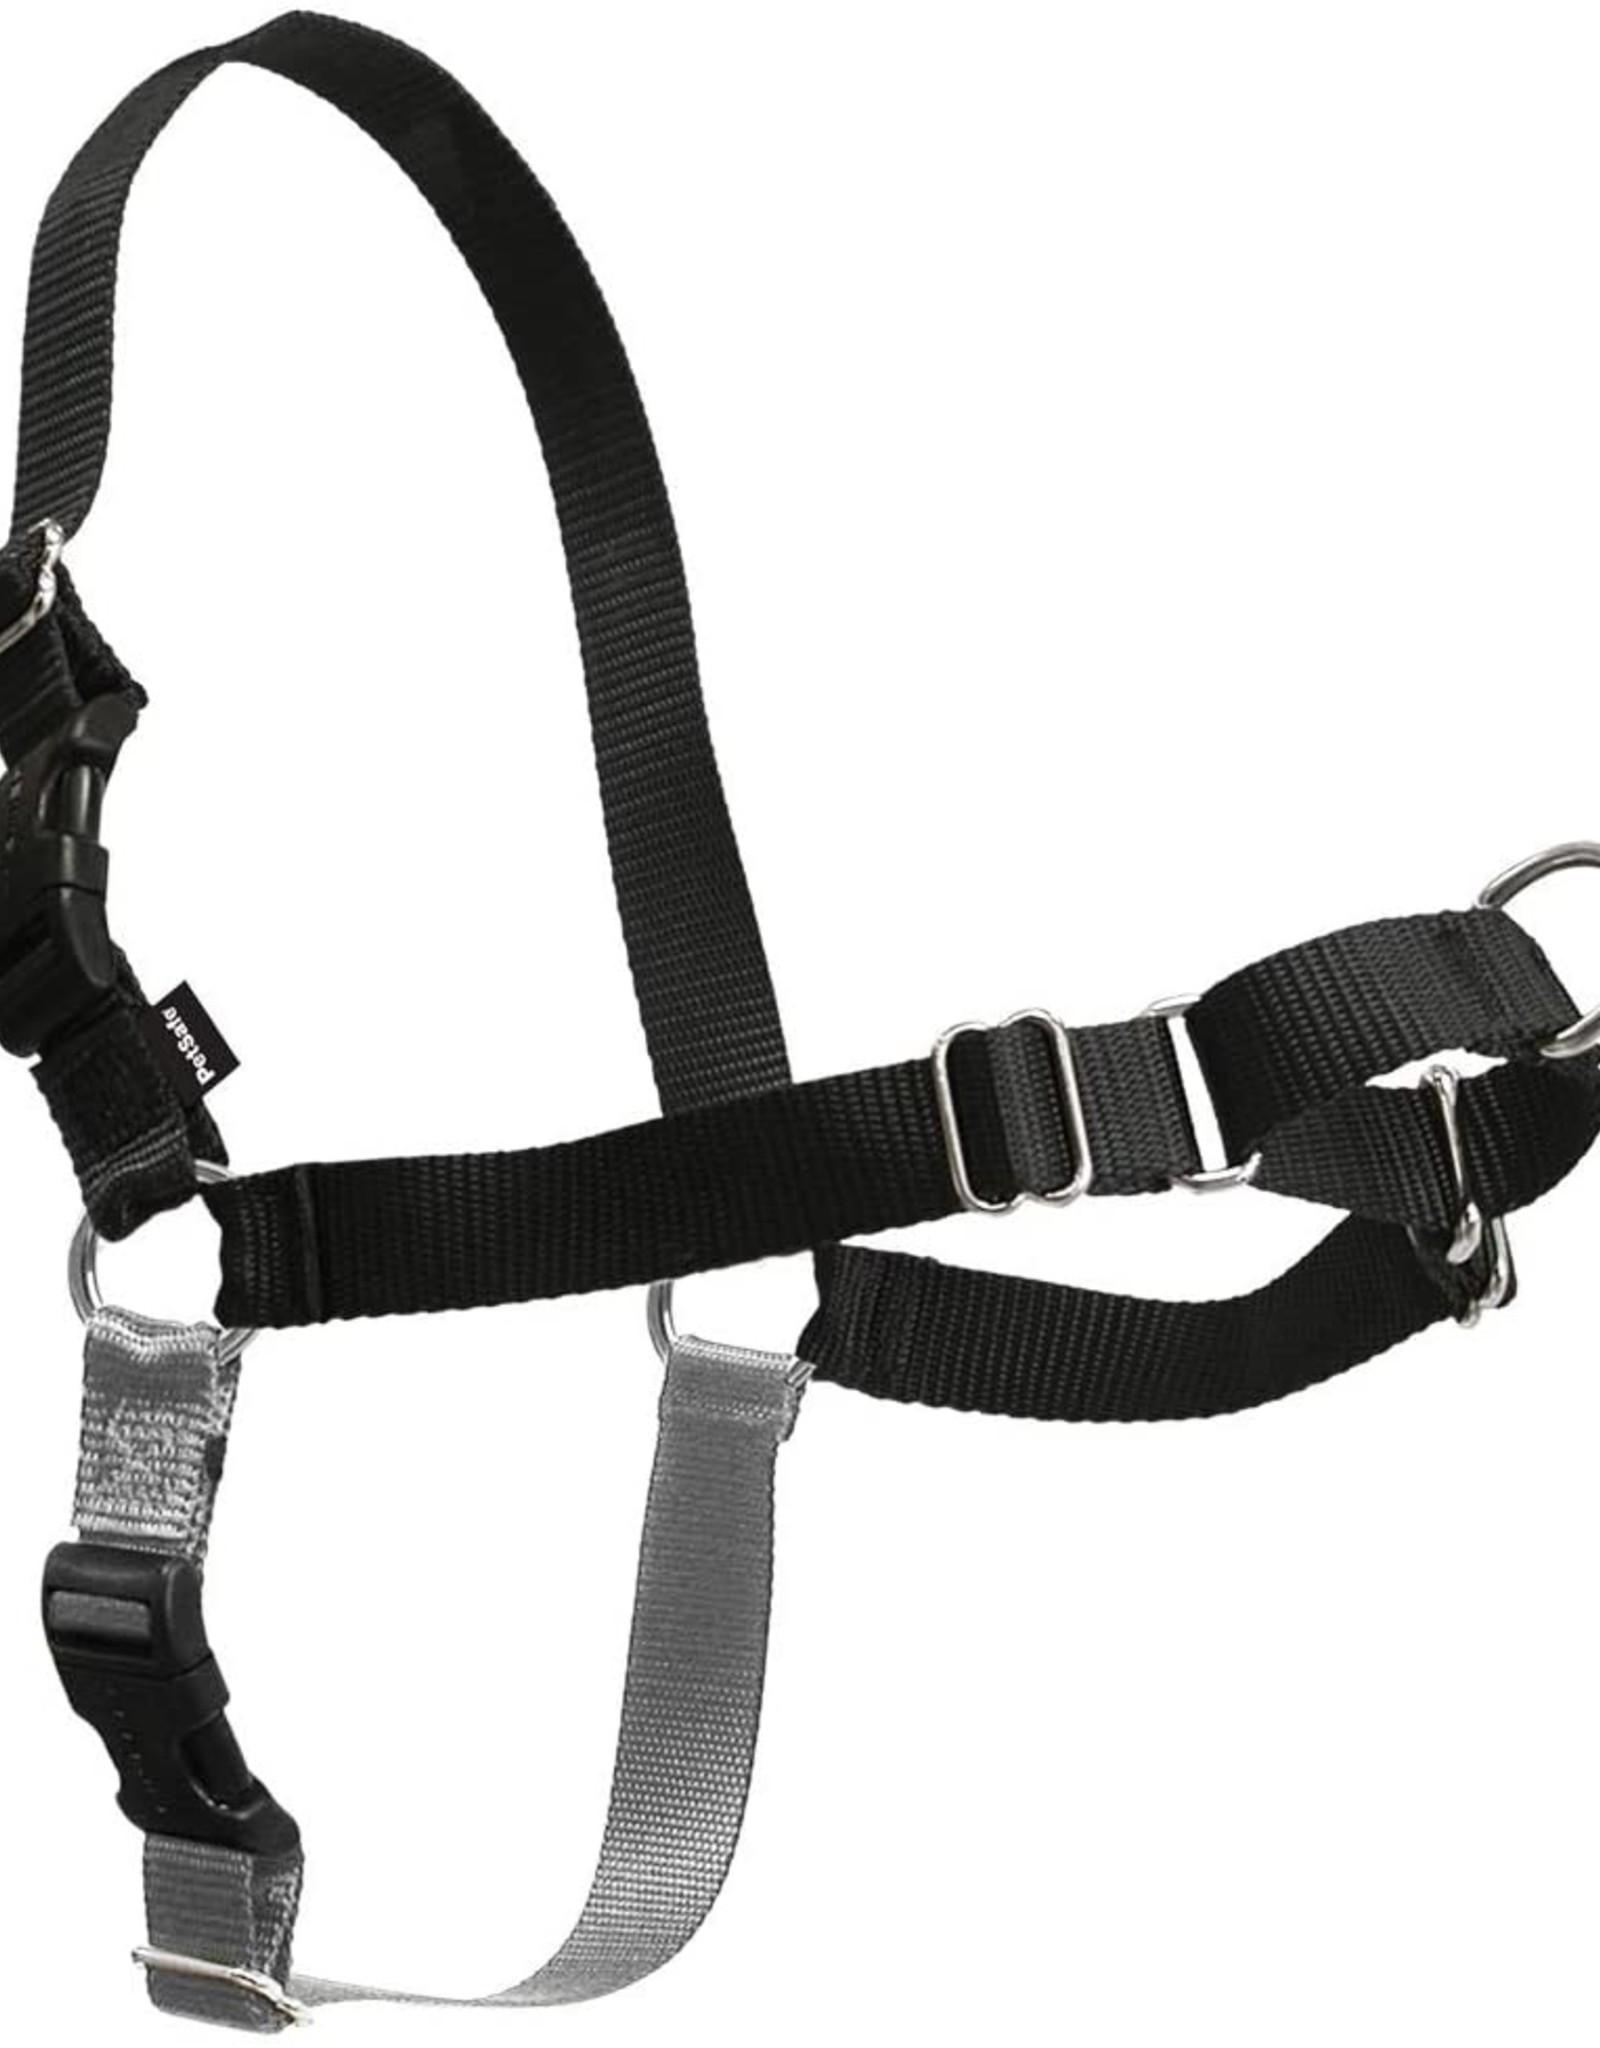 Easy Walk Harness Small/Medium (Black)